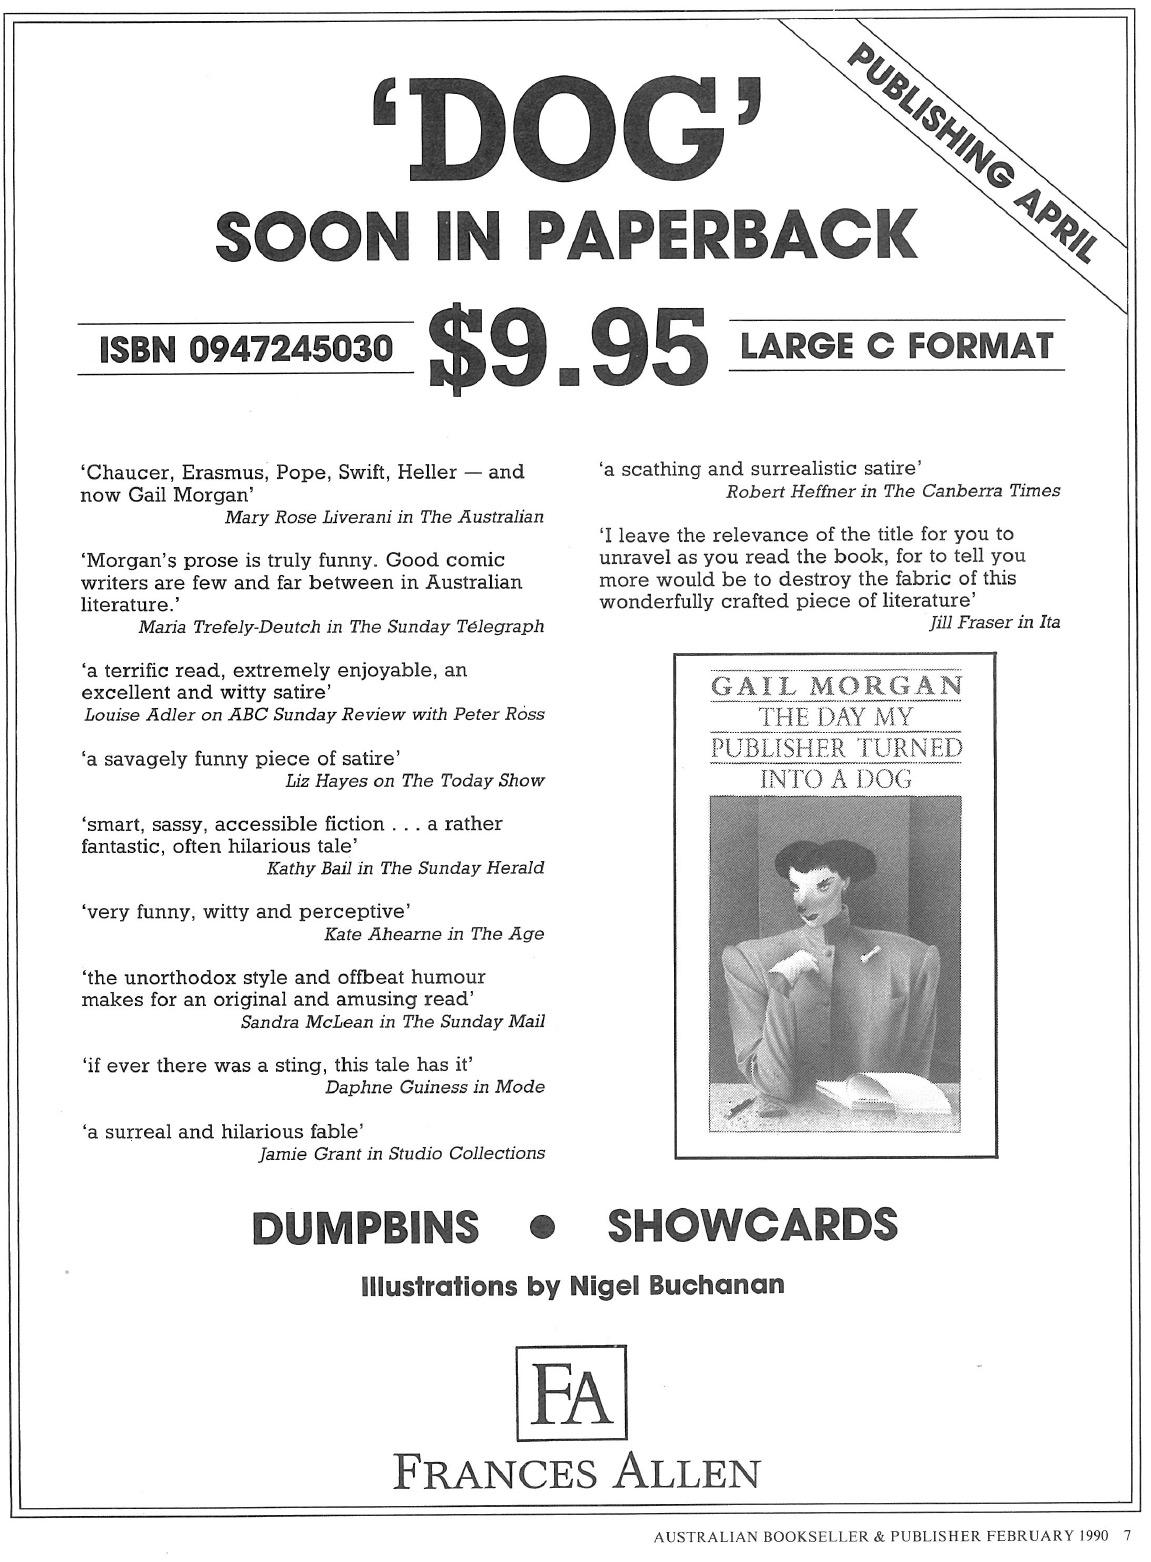 'Dog' soon in paperback